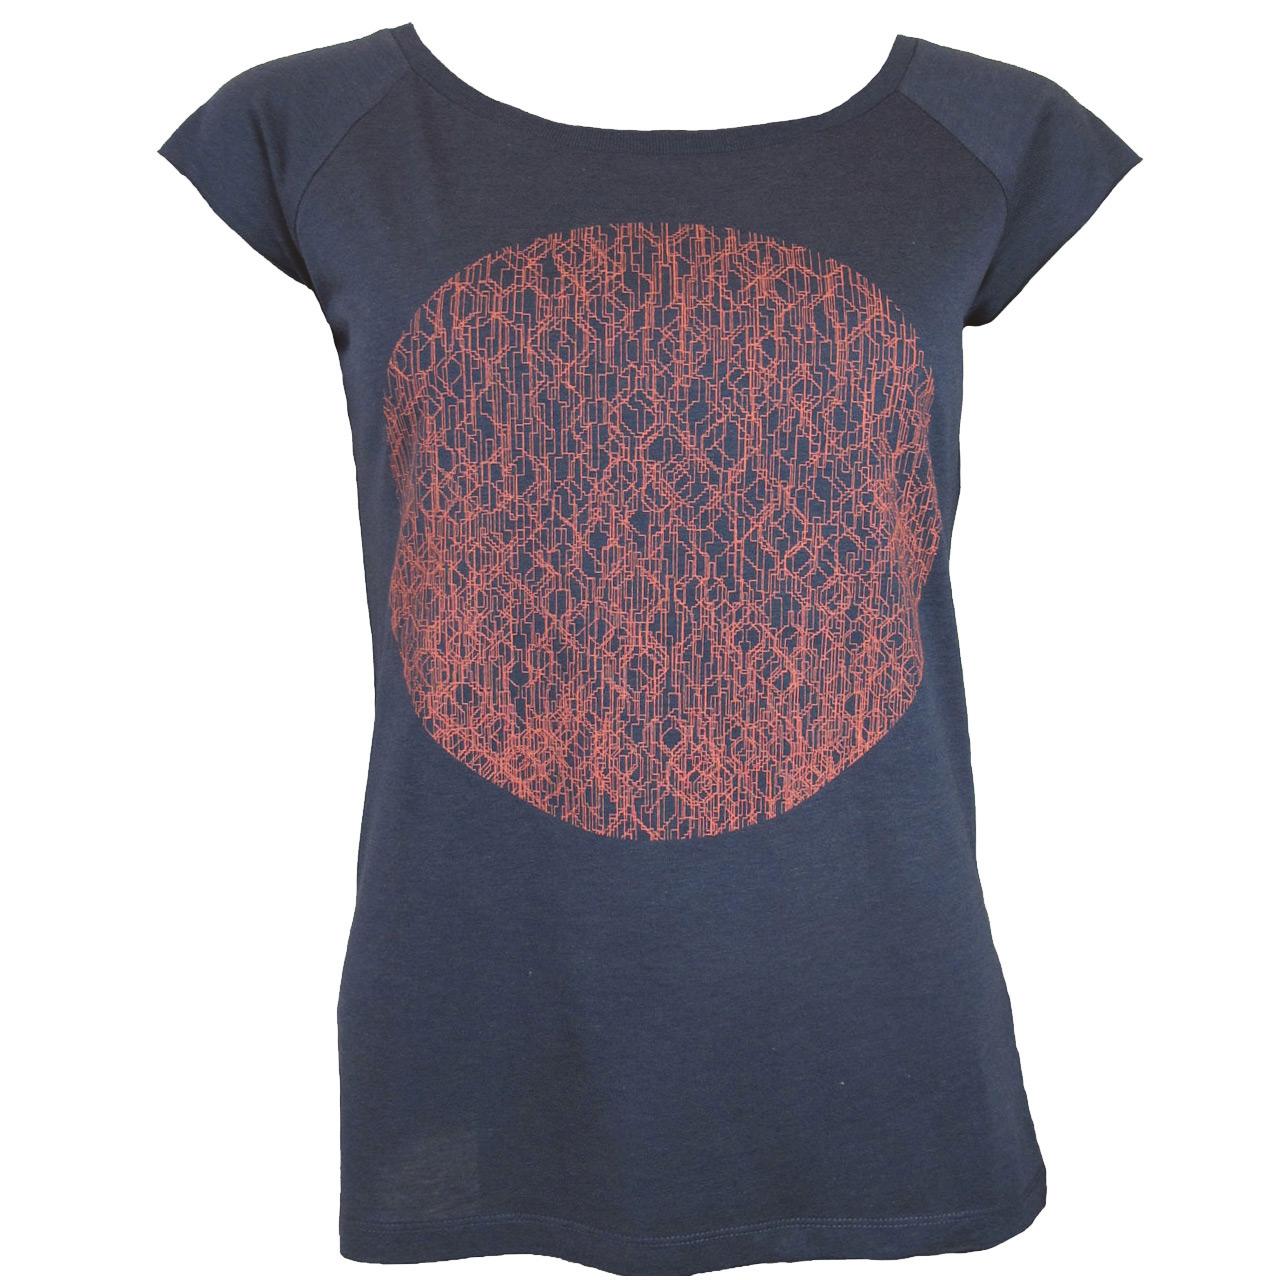 Berlin Design T-Shirt Fernsehturm Kreis girls grau/neonorange